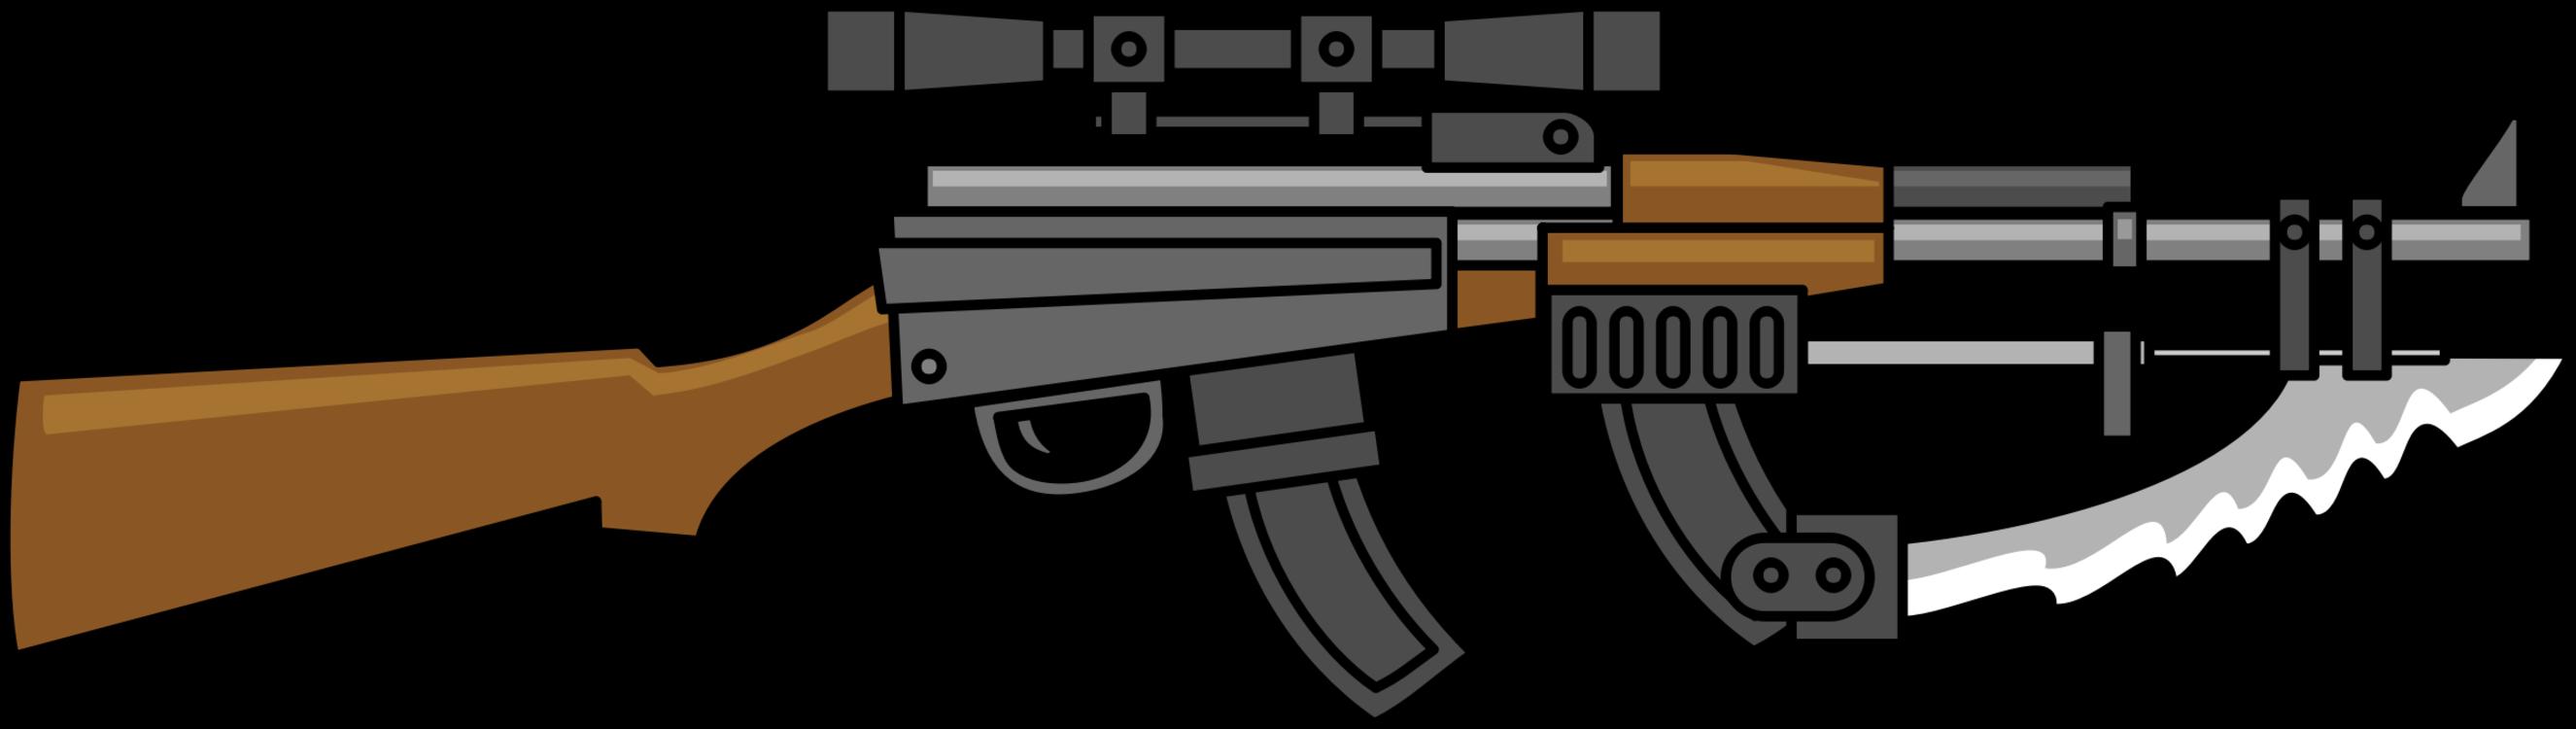 Gun Accessory,Machine Gun,Sniper Rifle